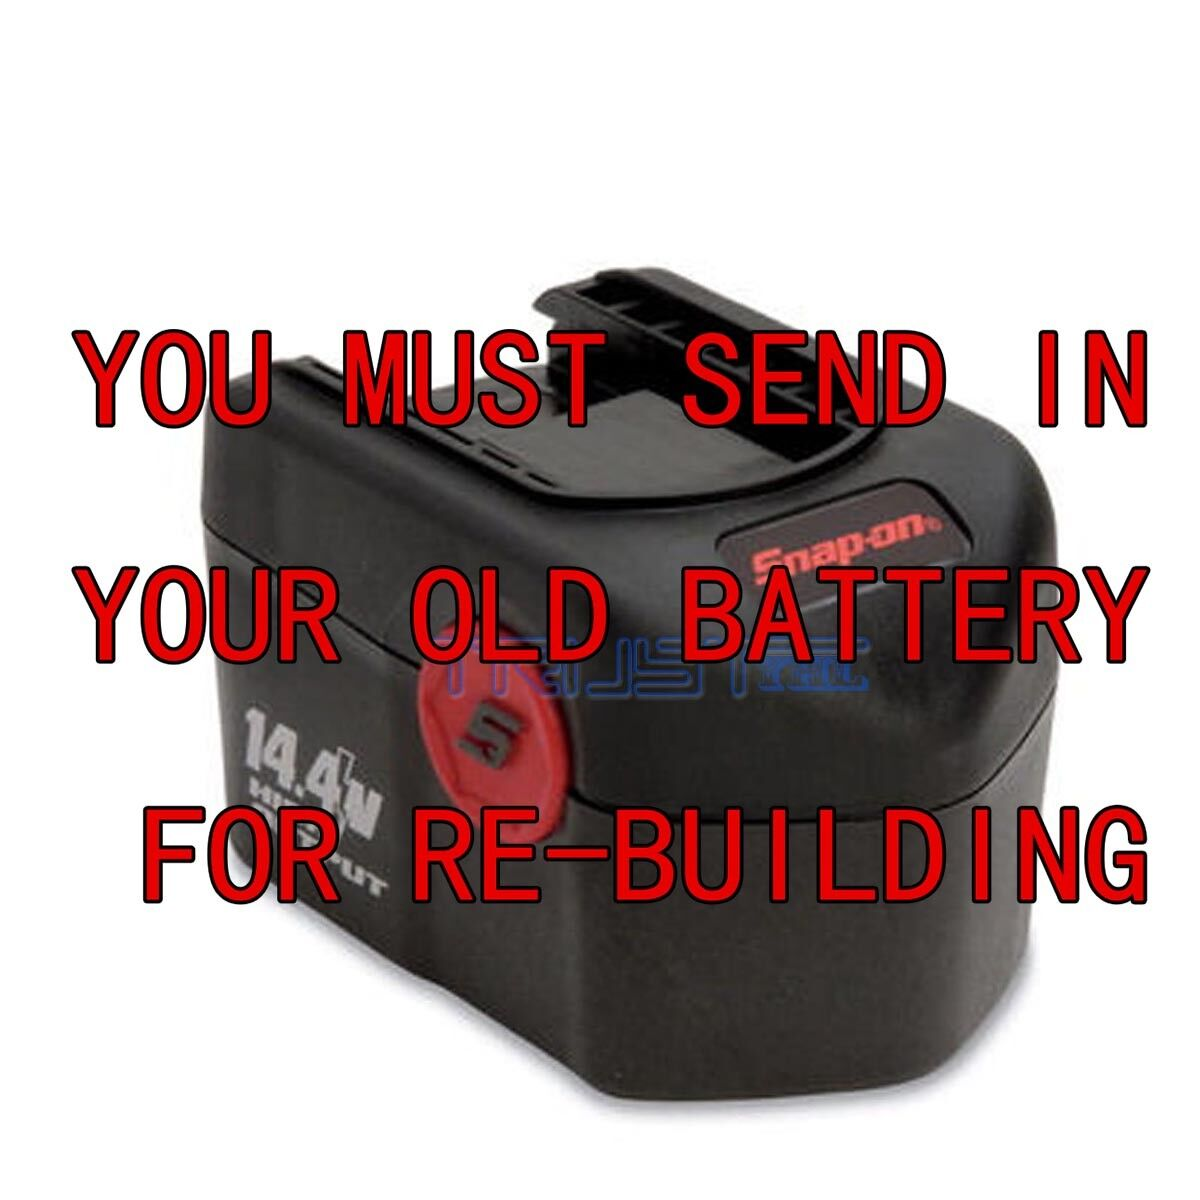 For Snap-on 14.4v 2.0AH CTB4147 Battery REBUILD Service WE REBUILD YOUR BATTERY